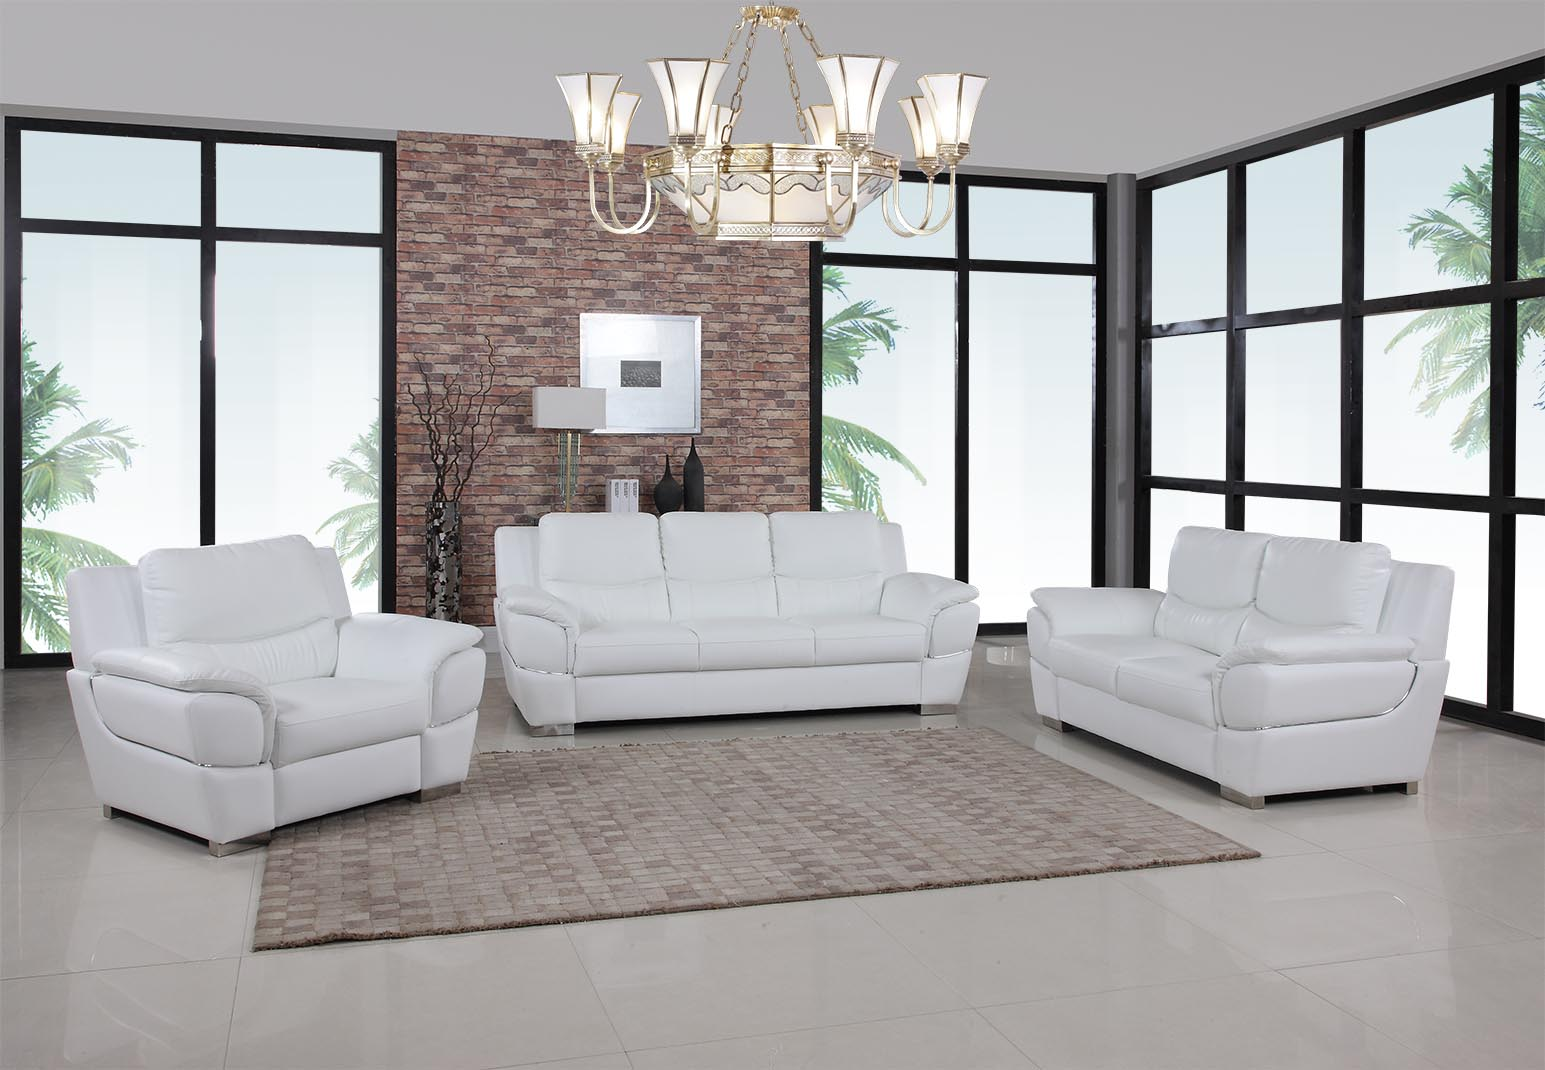 White Leather Living Room GU4572 - Casye FurnitureCasye Furniture